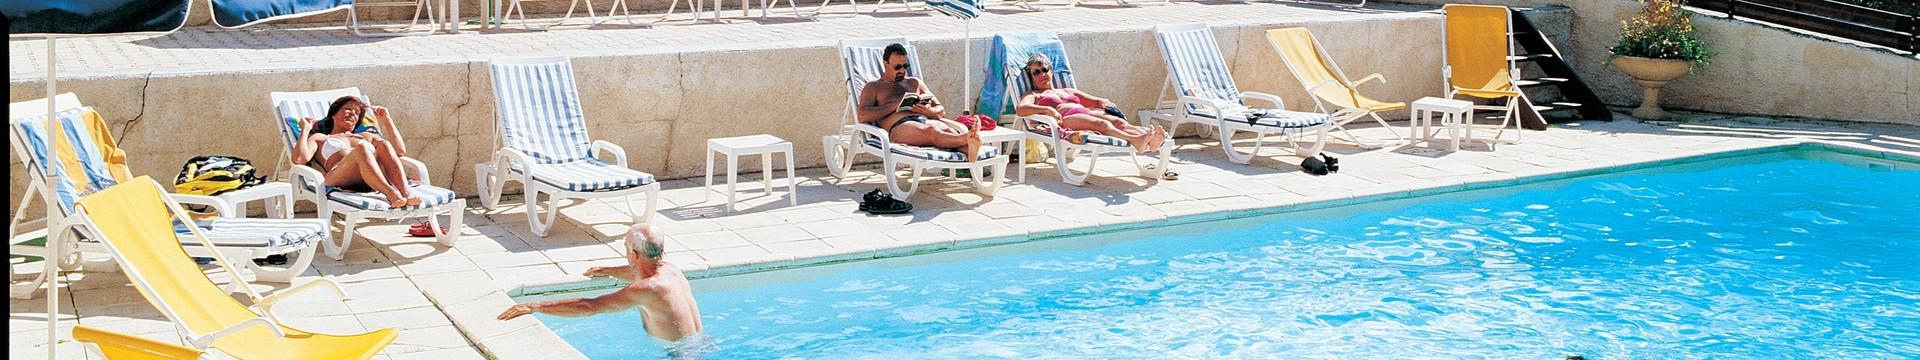 piscine-9195-9838